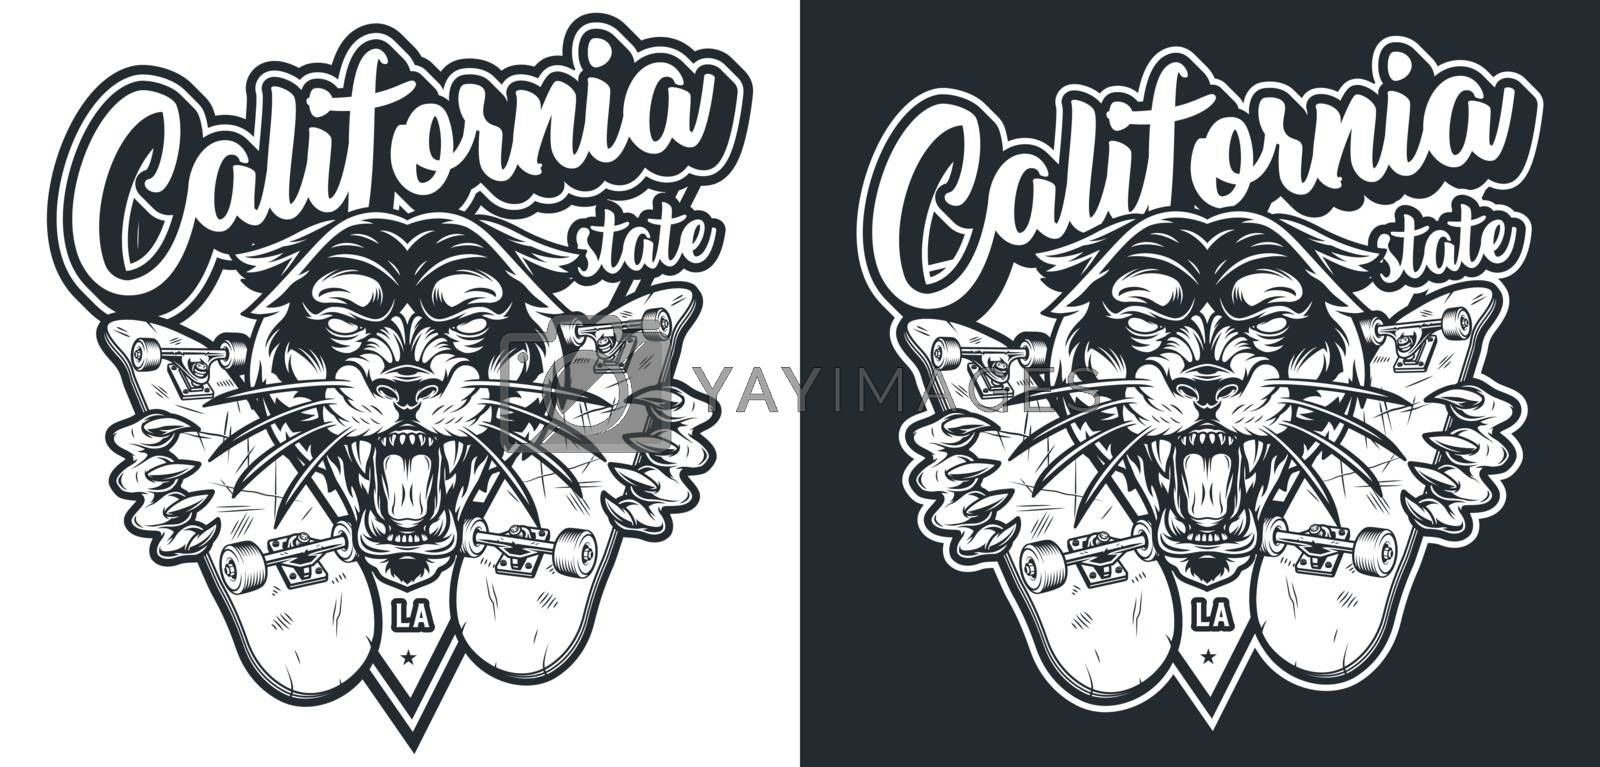 Monochrome vintage skateboarding logo with cruel ferocious black panther holding skateboards isolated vector illustration